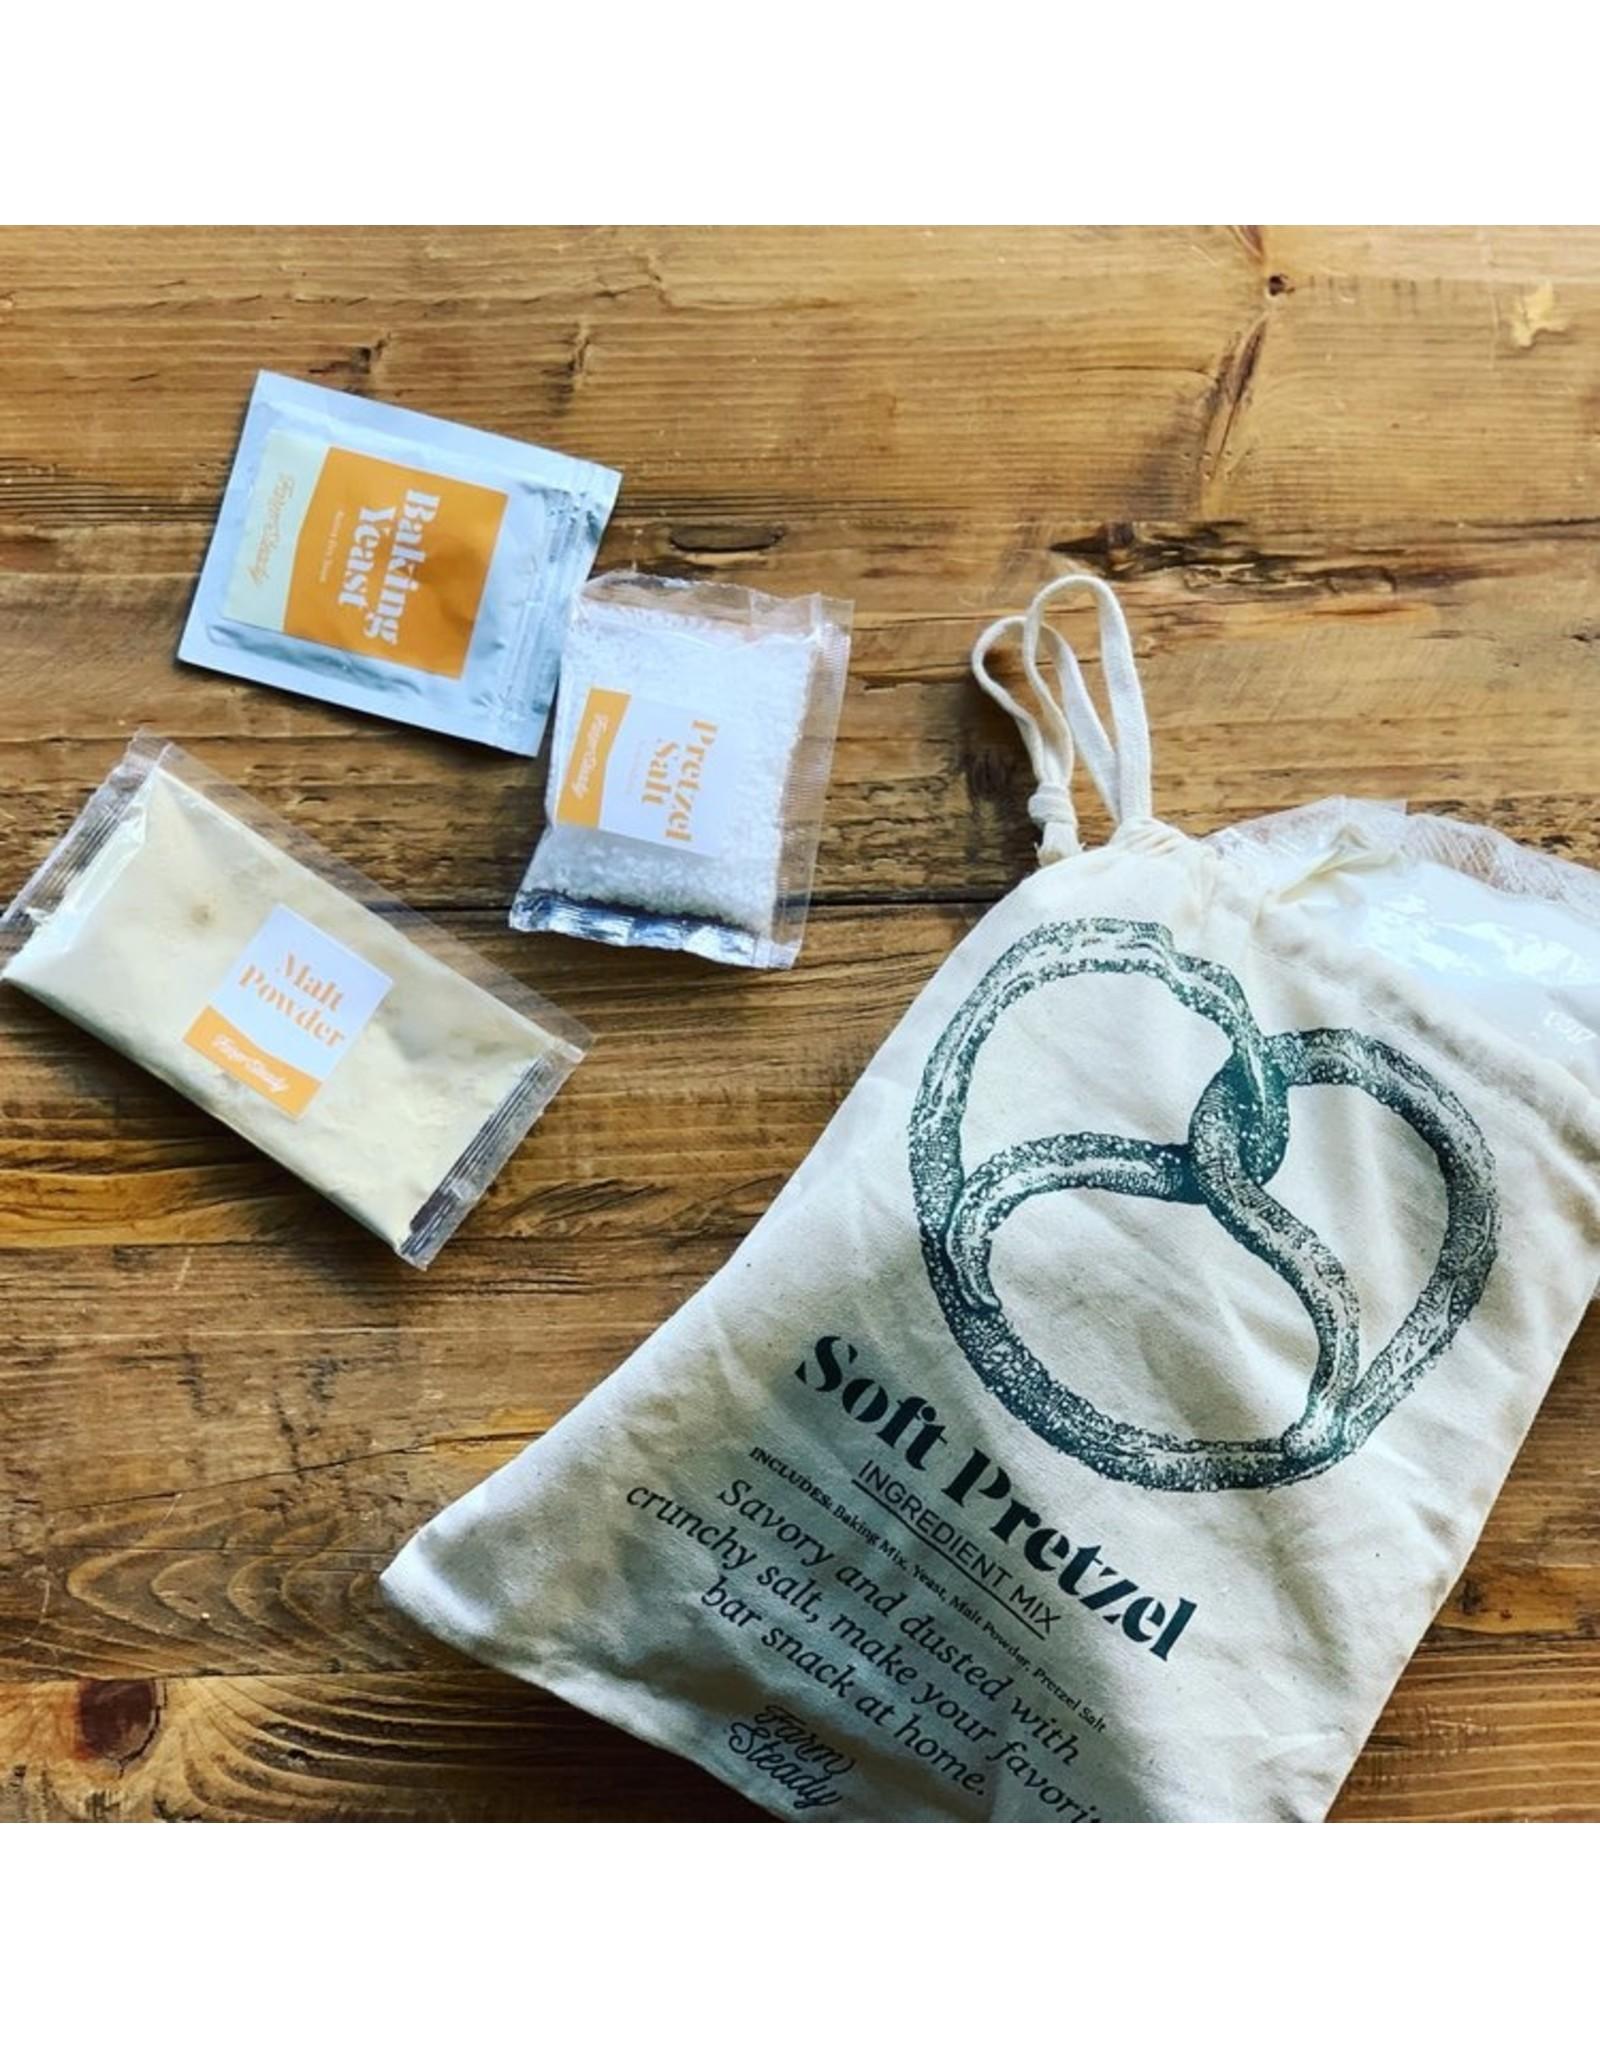 Farm Steady Soft Pretzel Making Kit